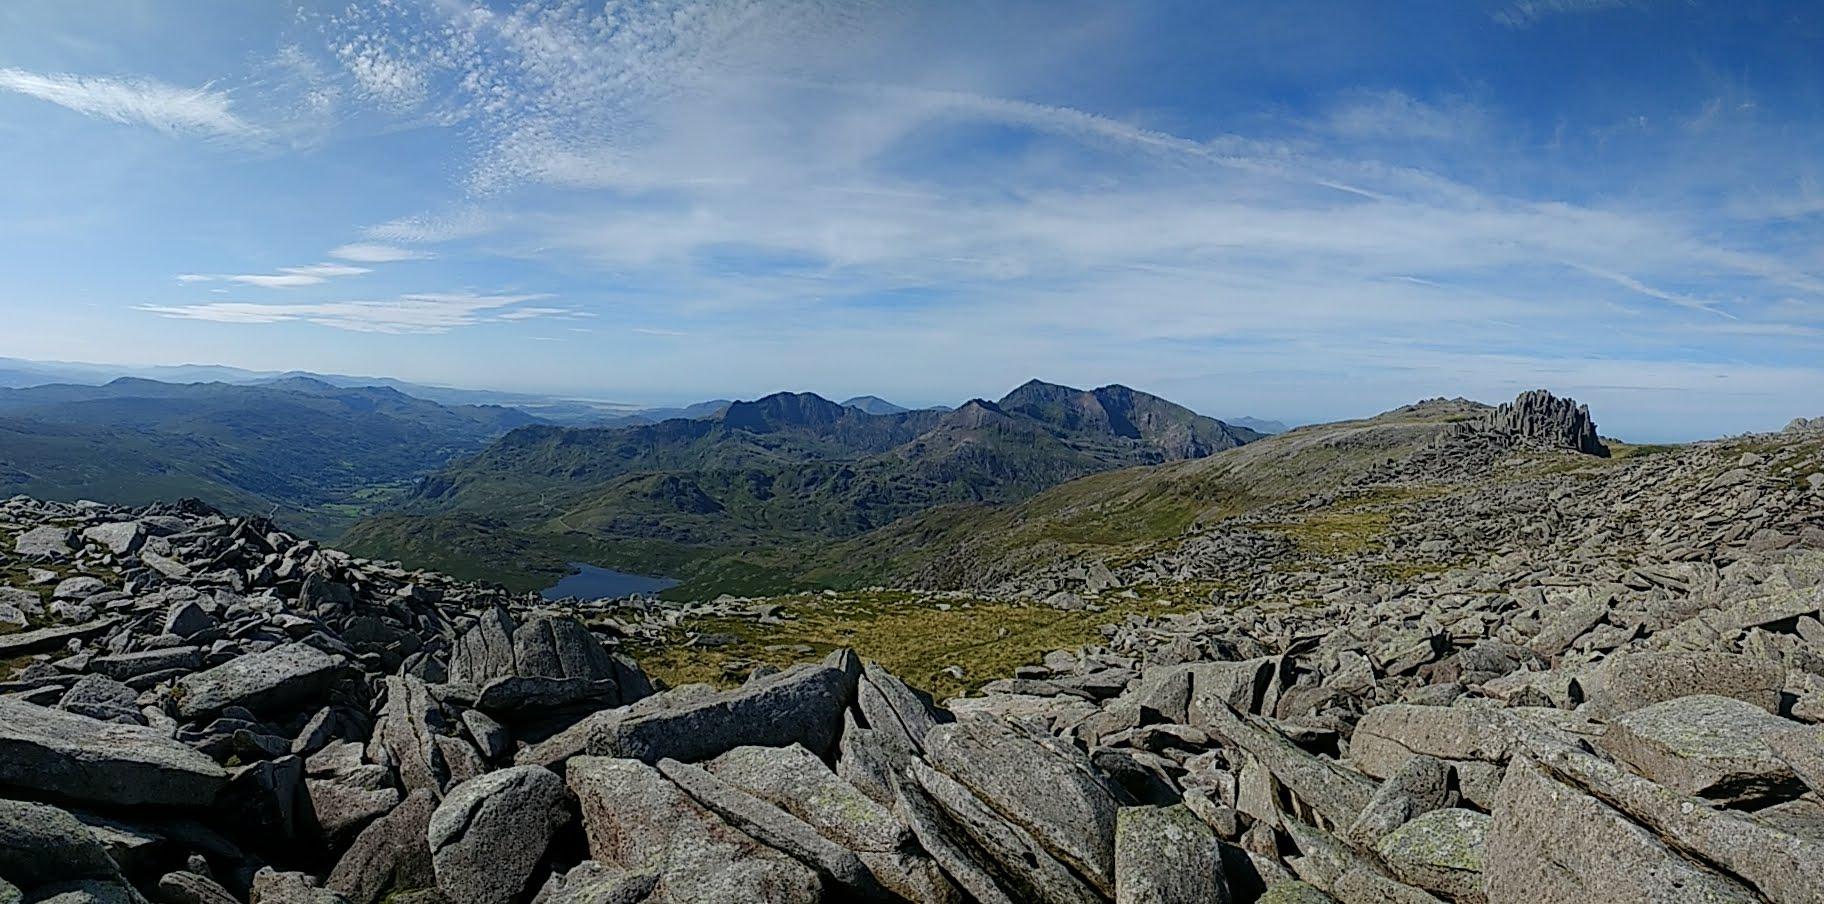 Snowdon Range taken from the Glyderau